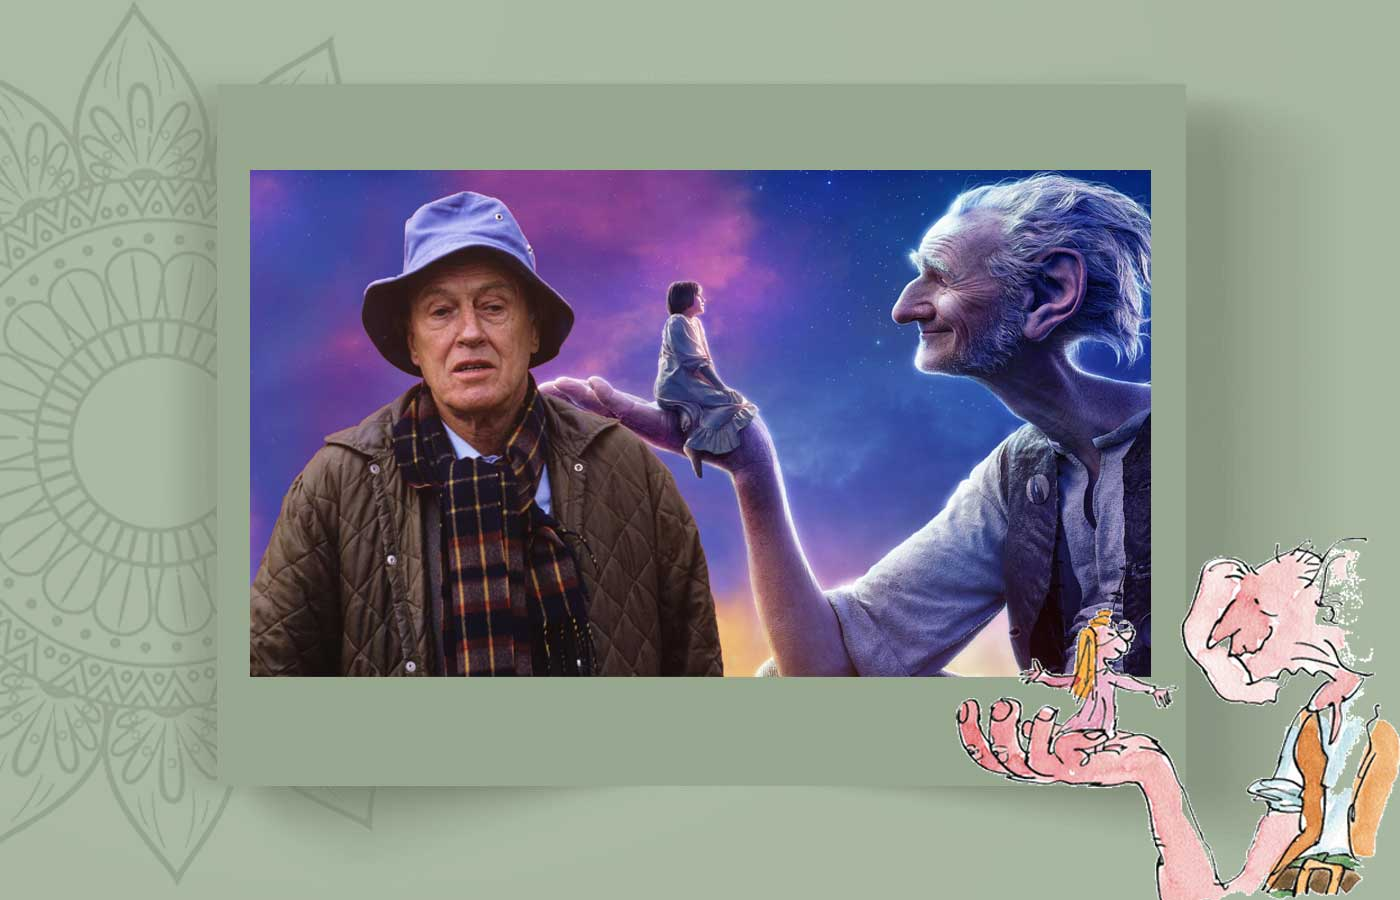 Roald Dah 3l - رولد دال و غول ادبیات کودکان ، Roald Dahl